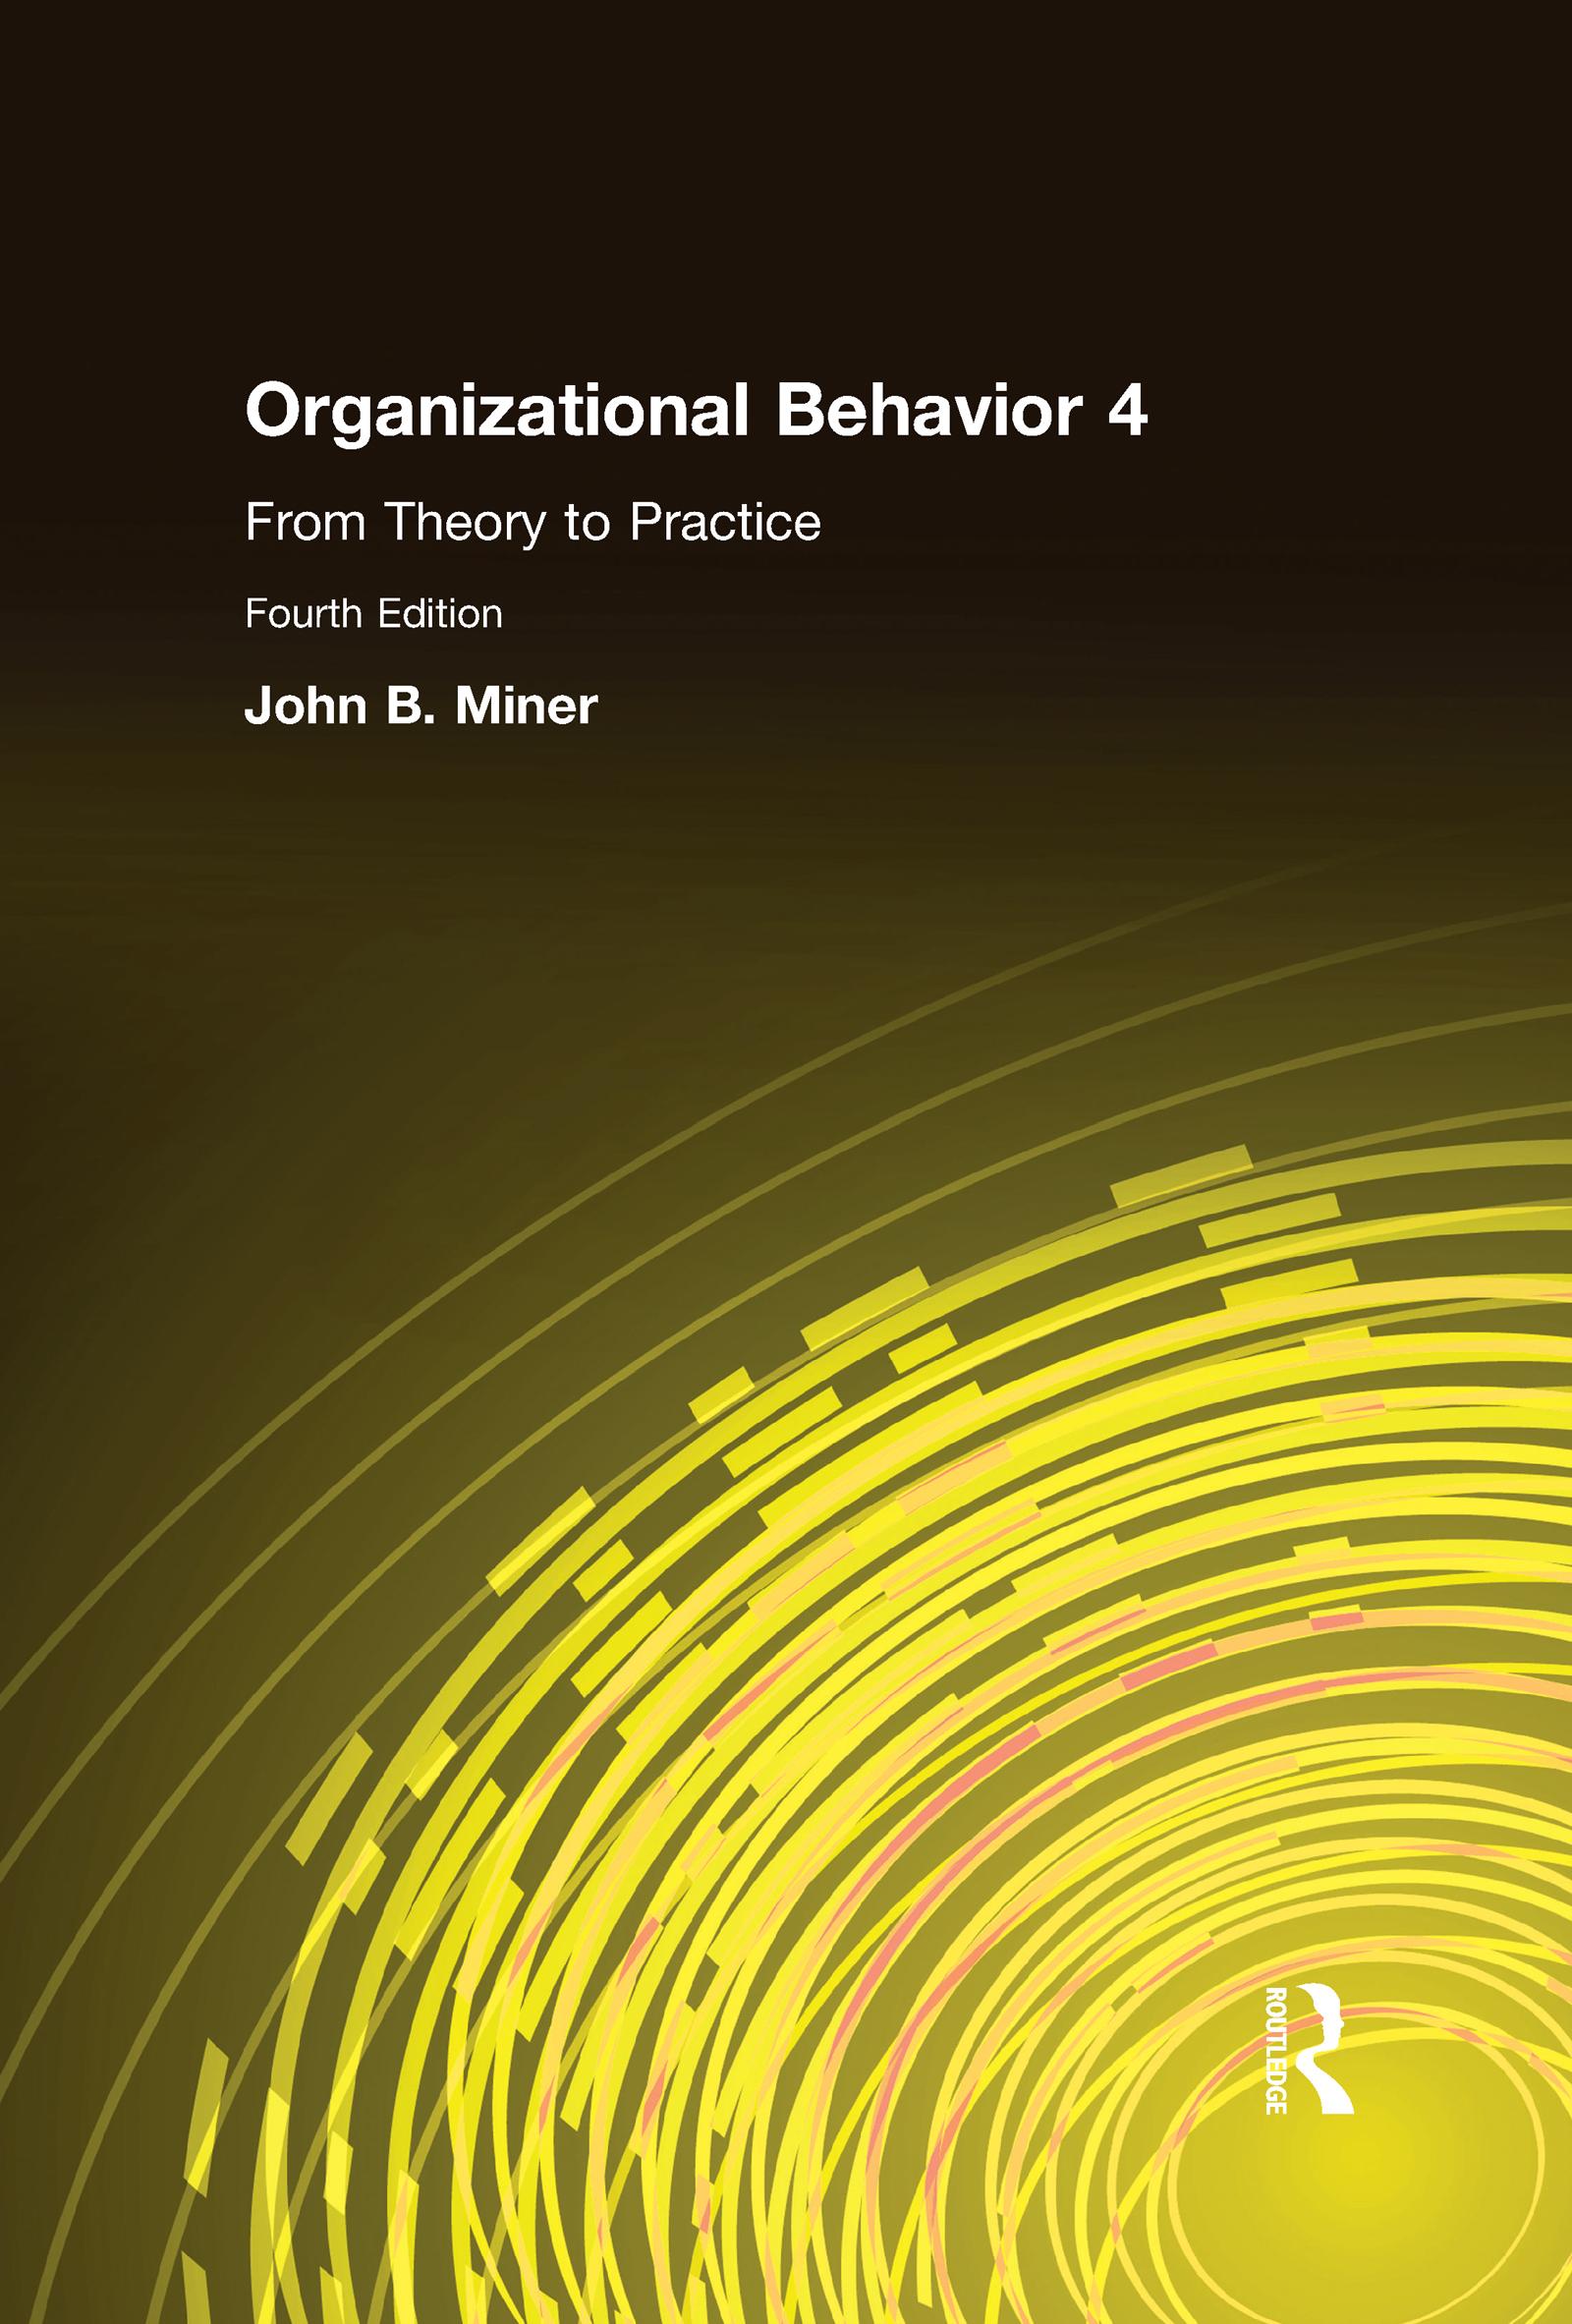 Organizational Behavior 4